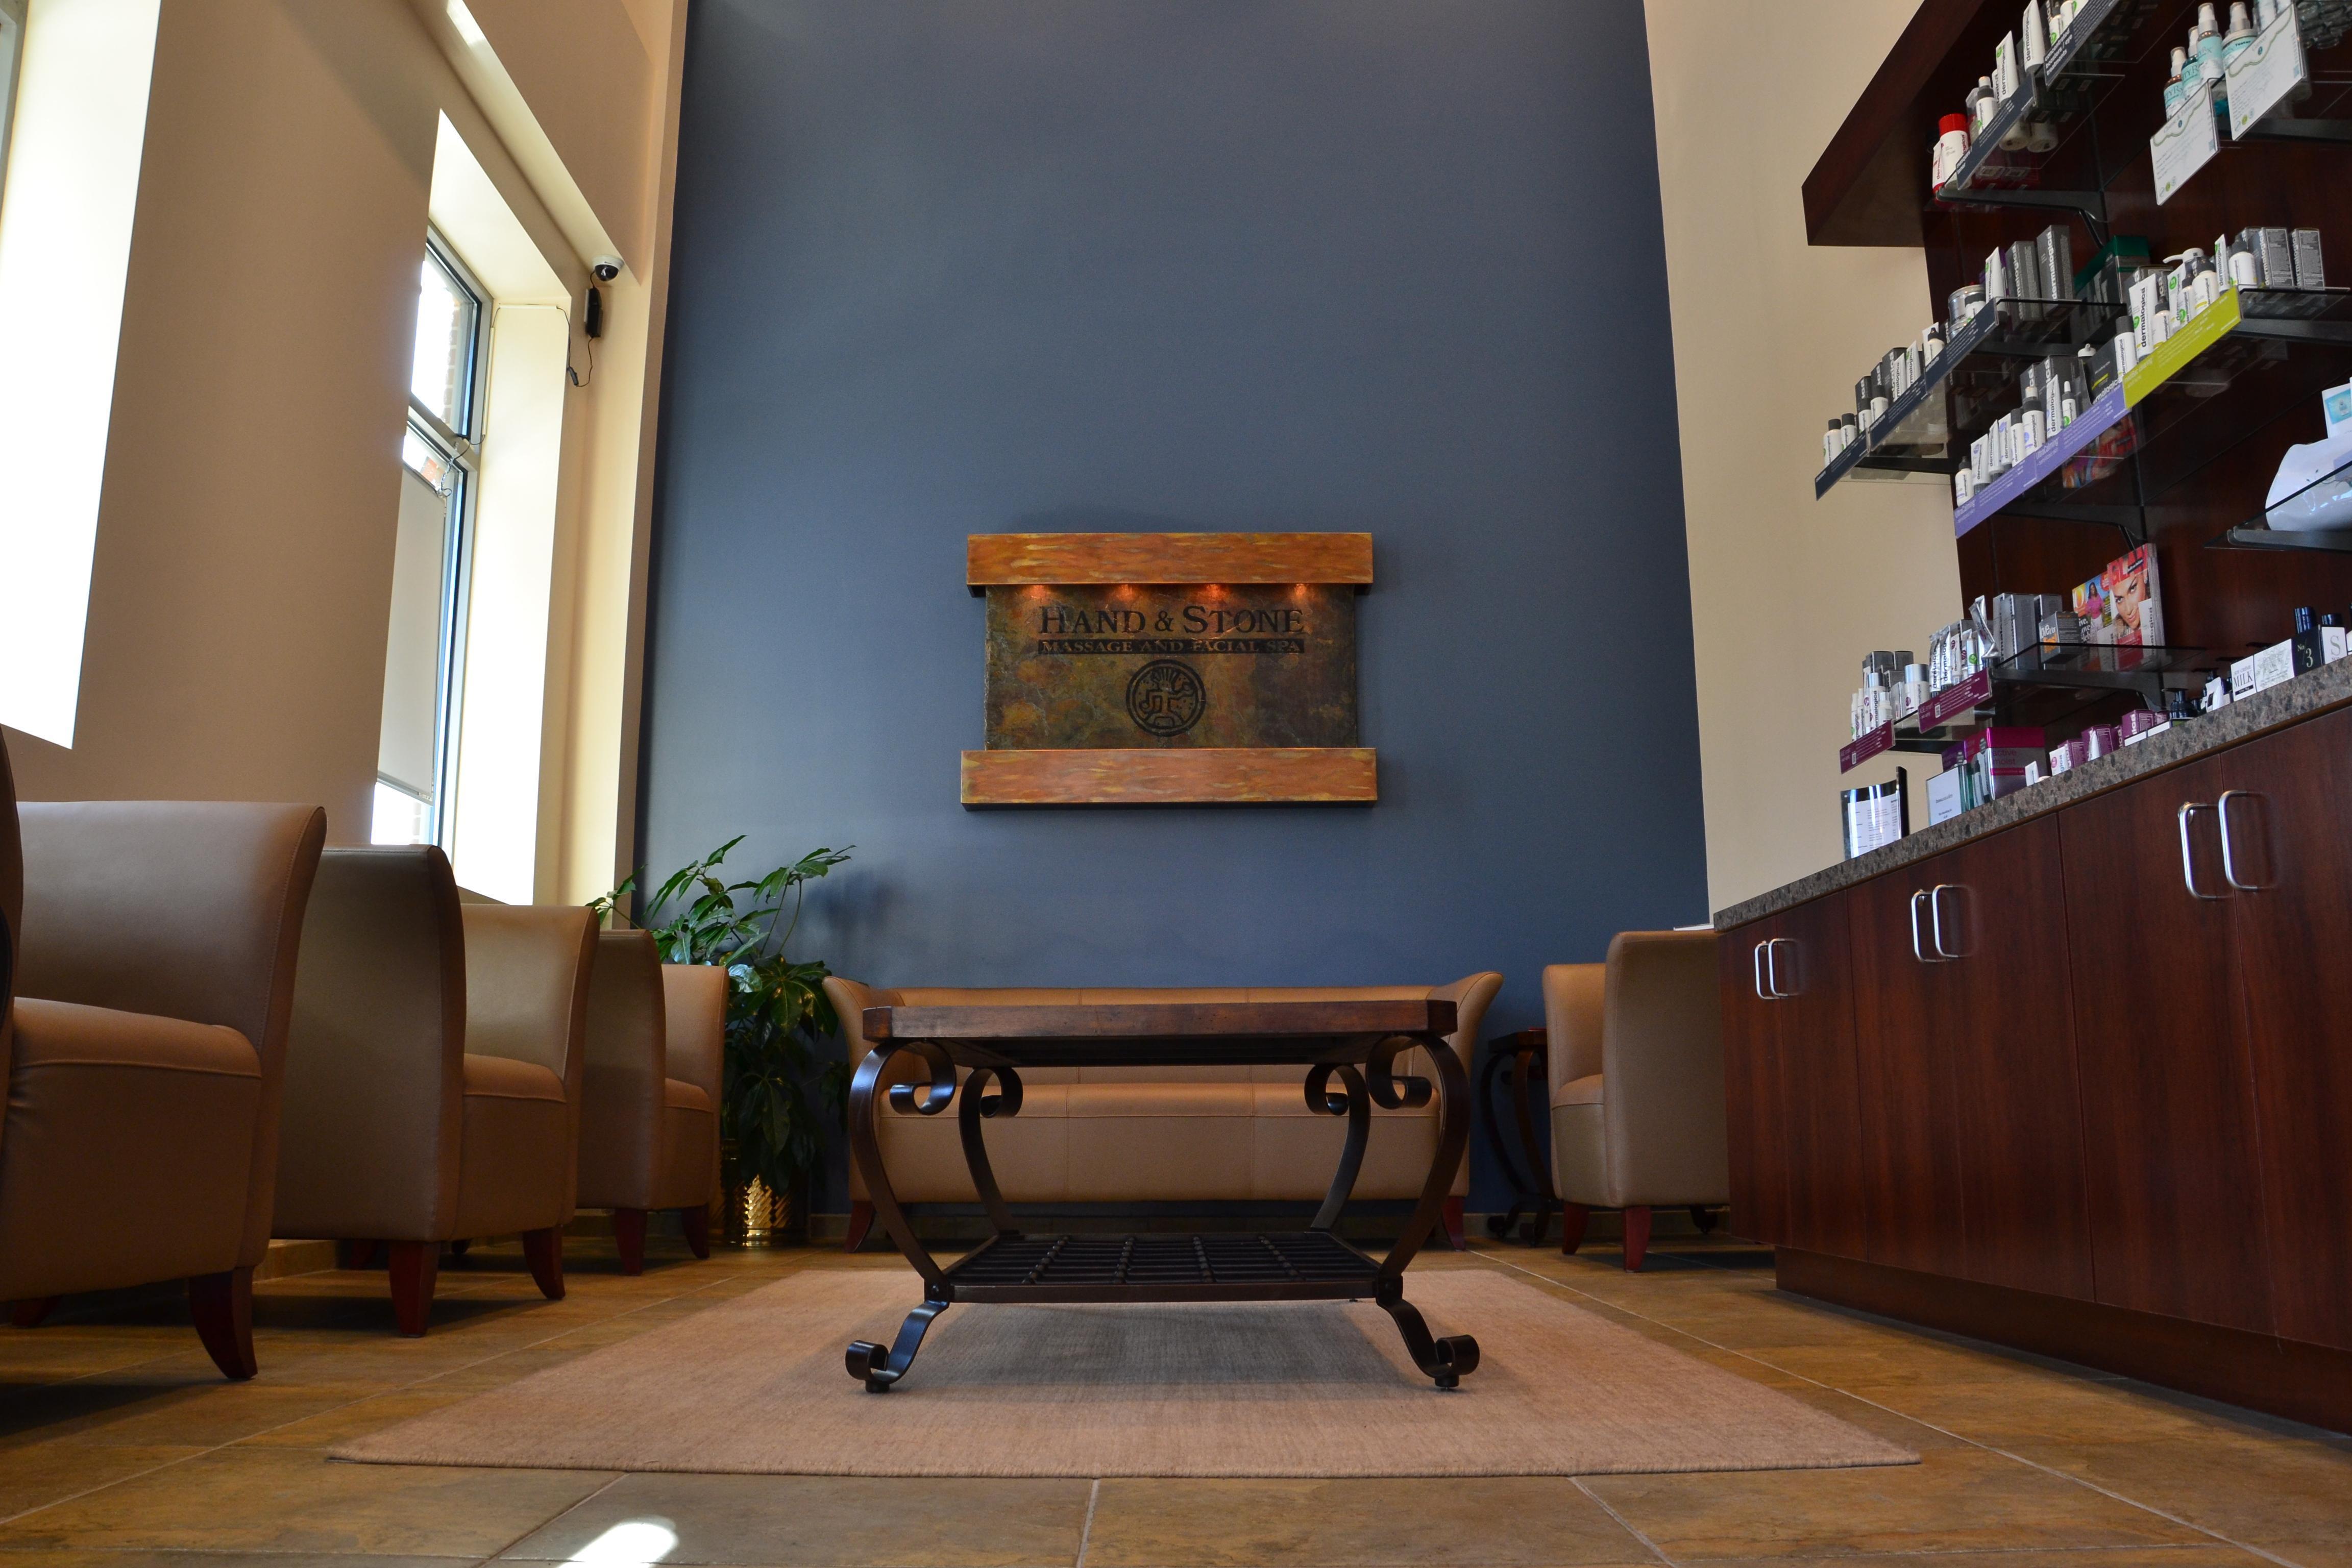 Hand & Stone Massage and Facial Spa Coupons Richmond VA ...